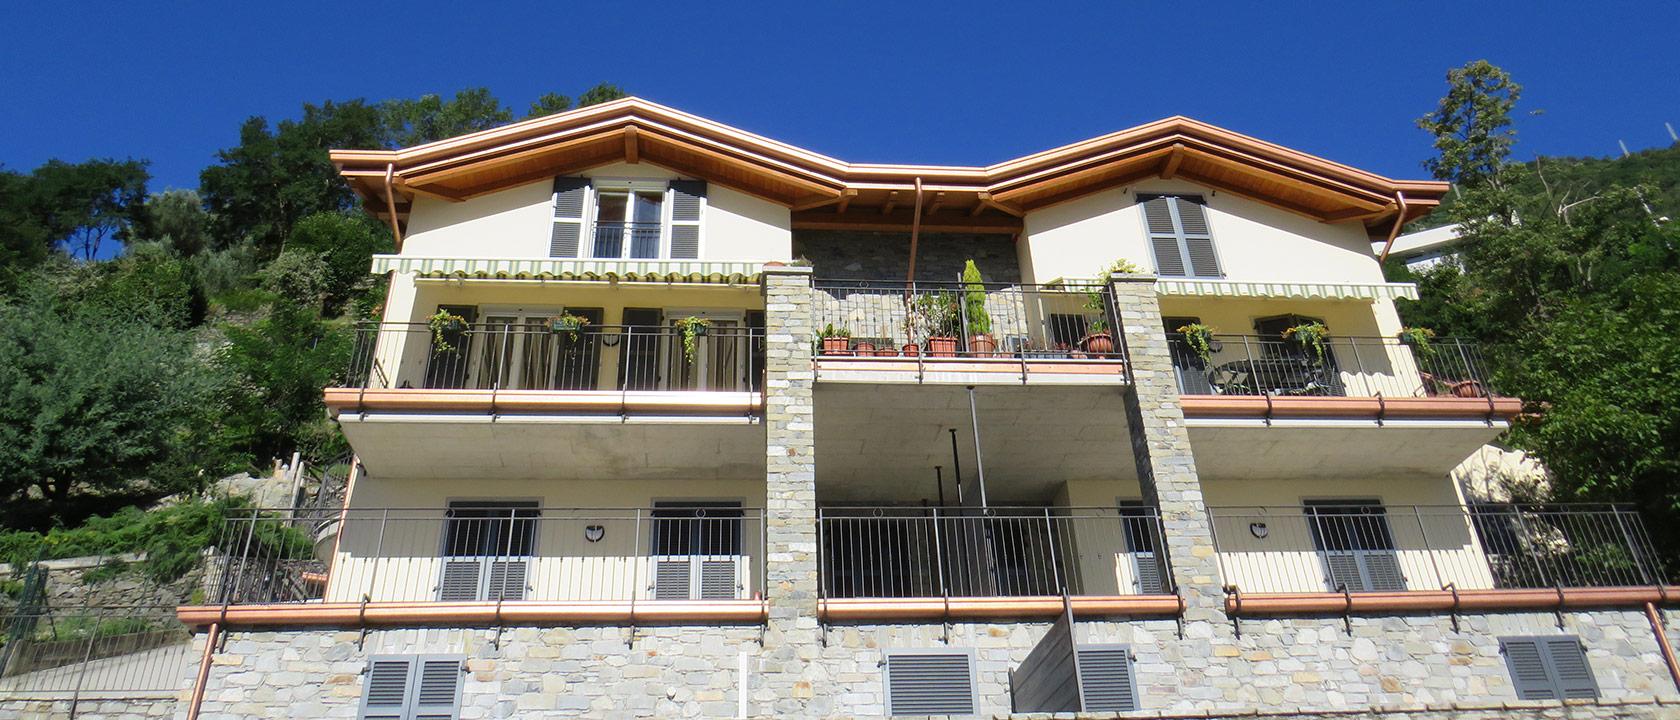 Impresa-Curti-Immobili-Vendita-Residenza-Pezzo-San-Siro-CO-Header-008.jpg